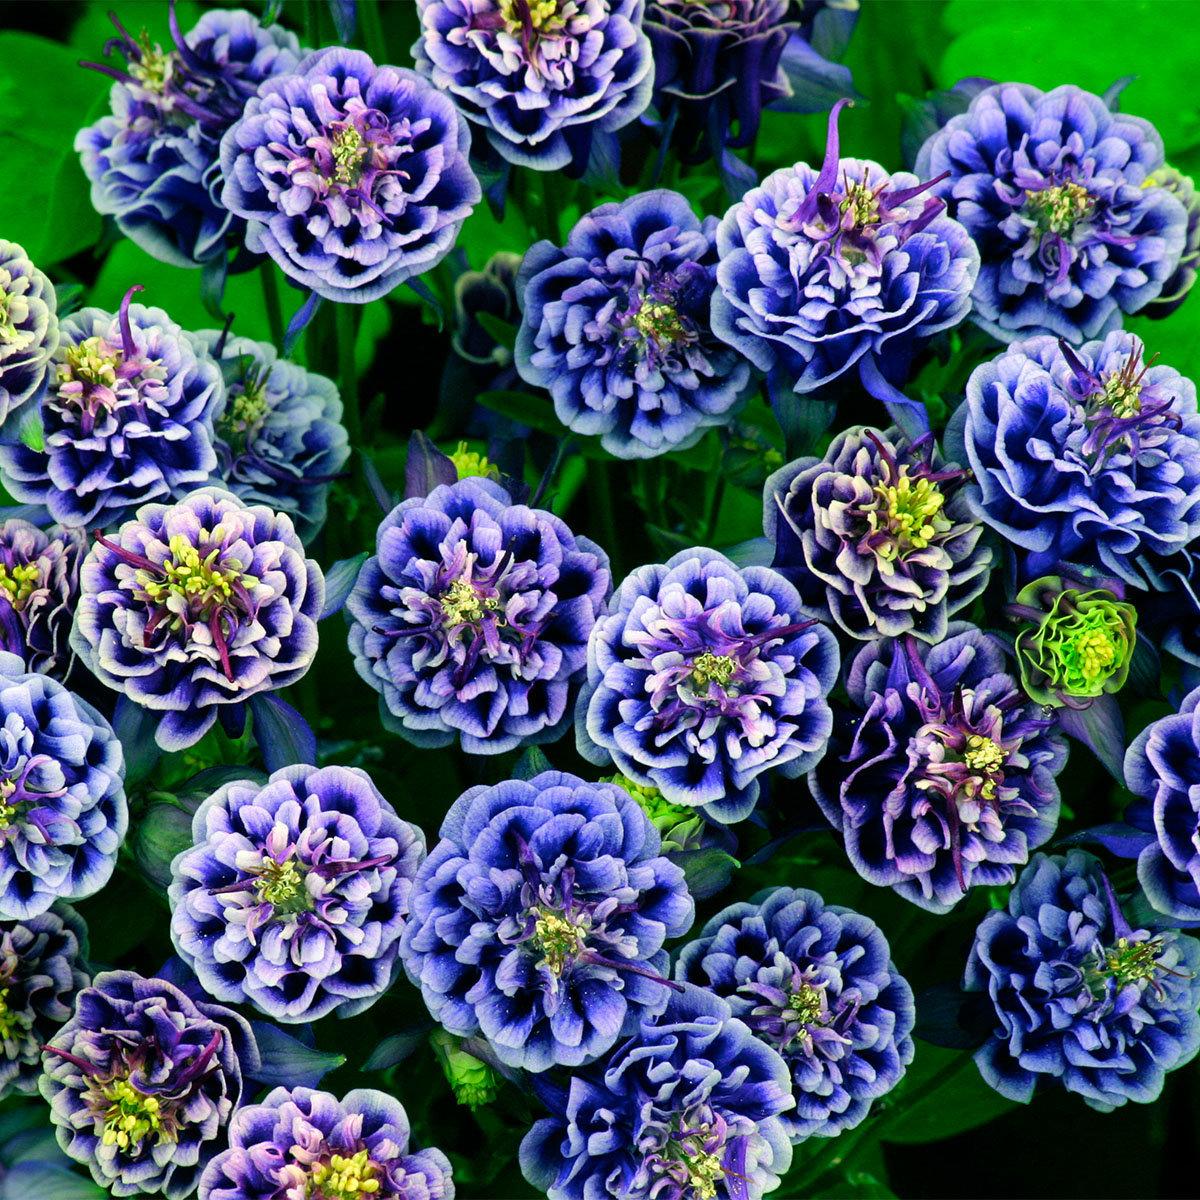 Garten-Akelei Winky Blue and White